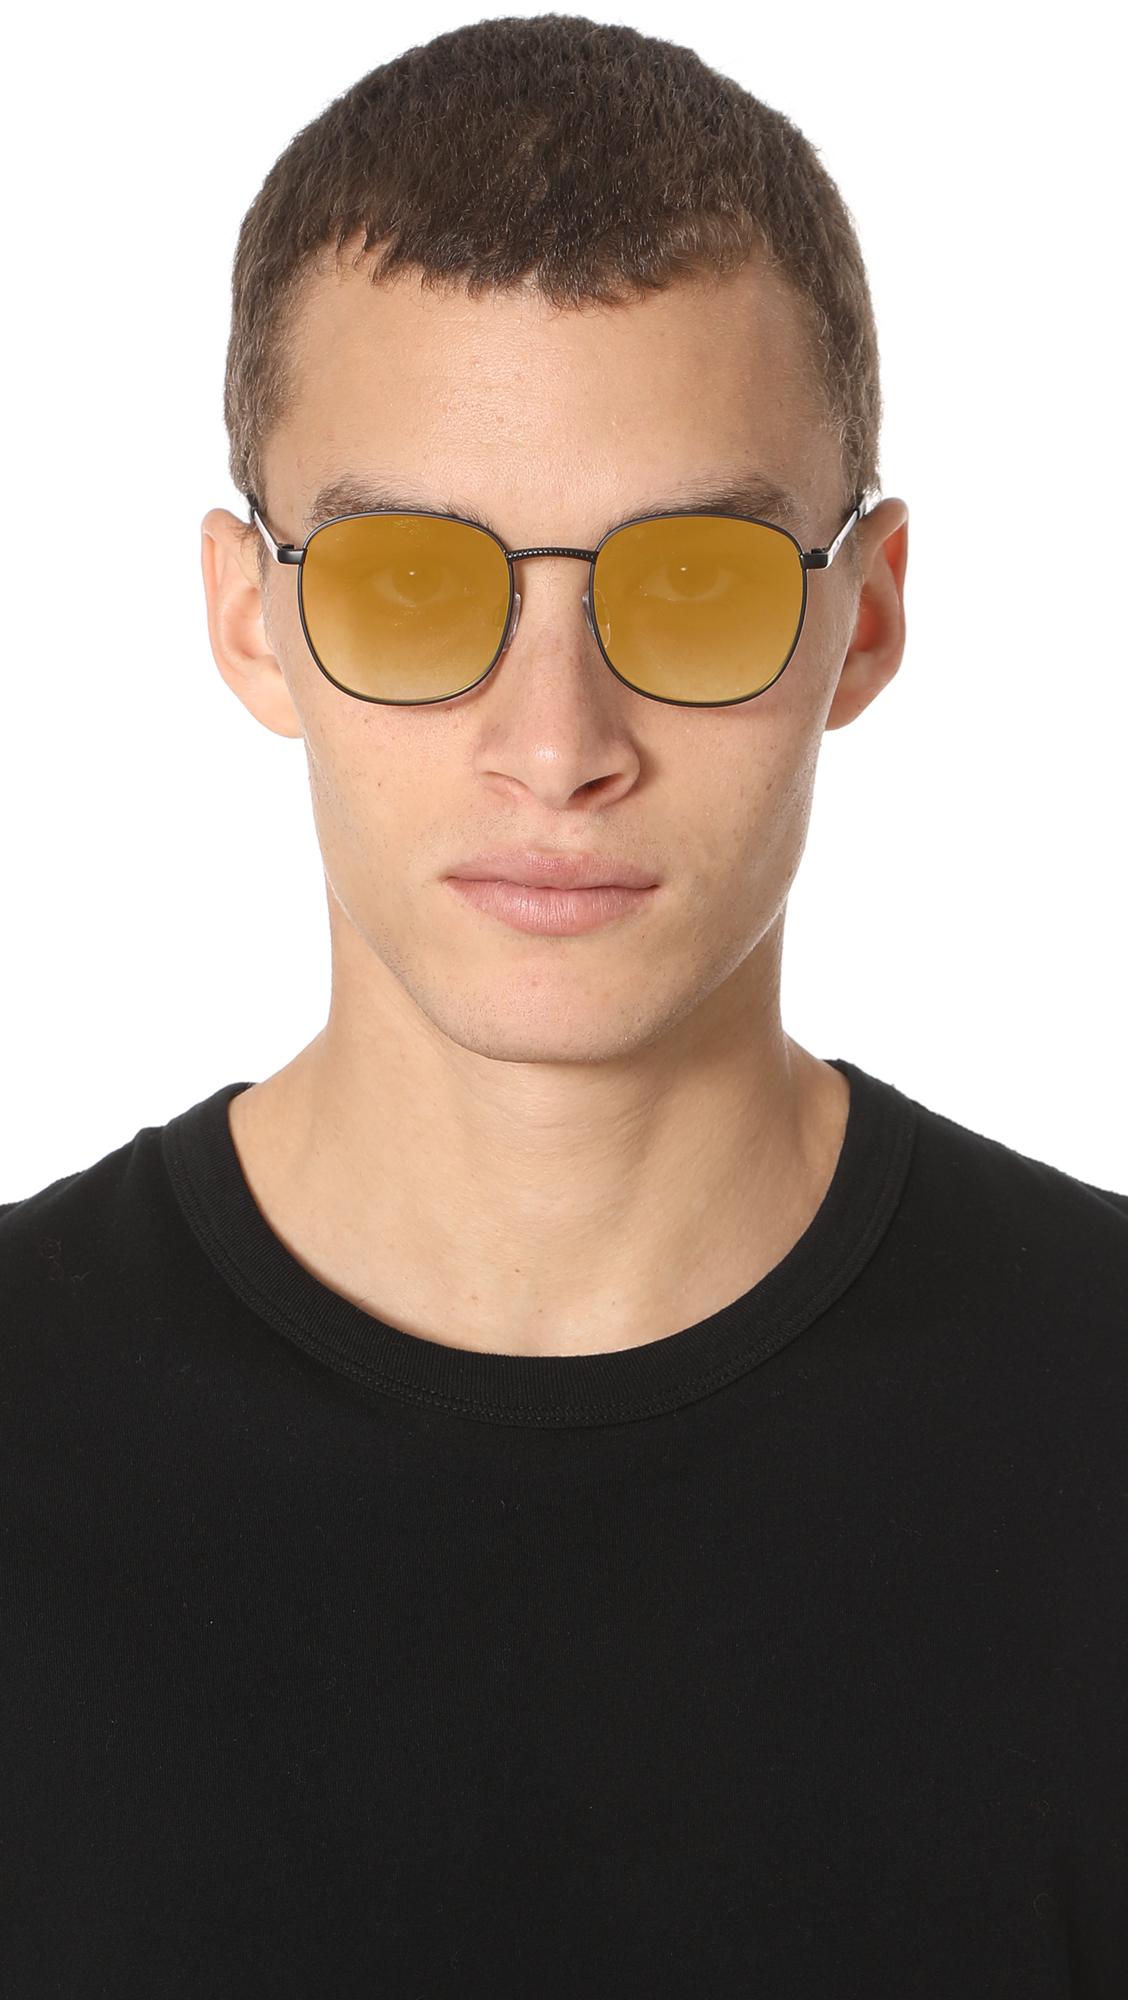 07efcf51663 Le Specs Neptune Sunglasses